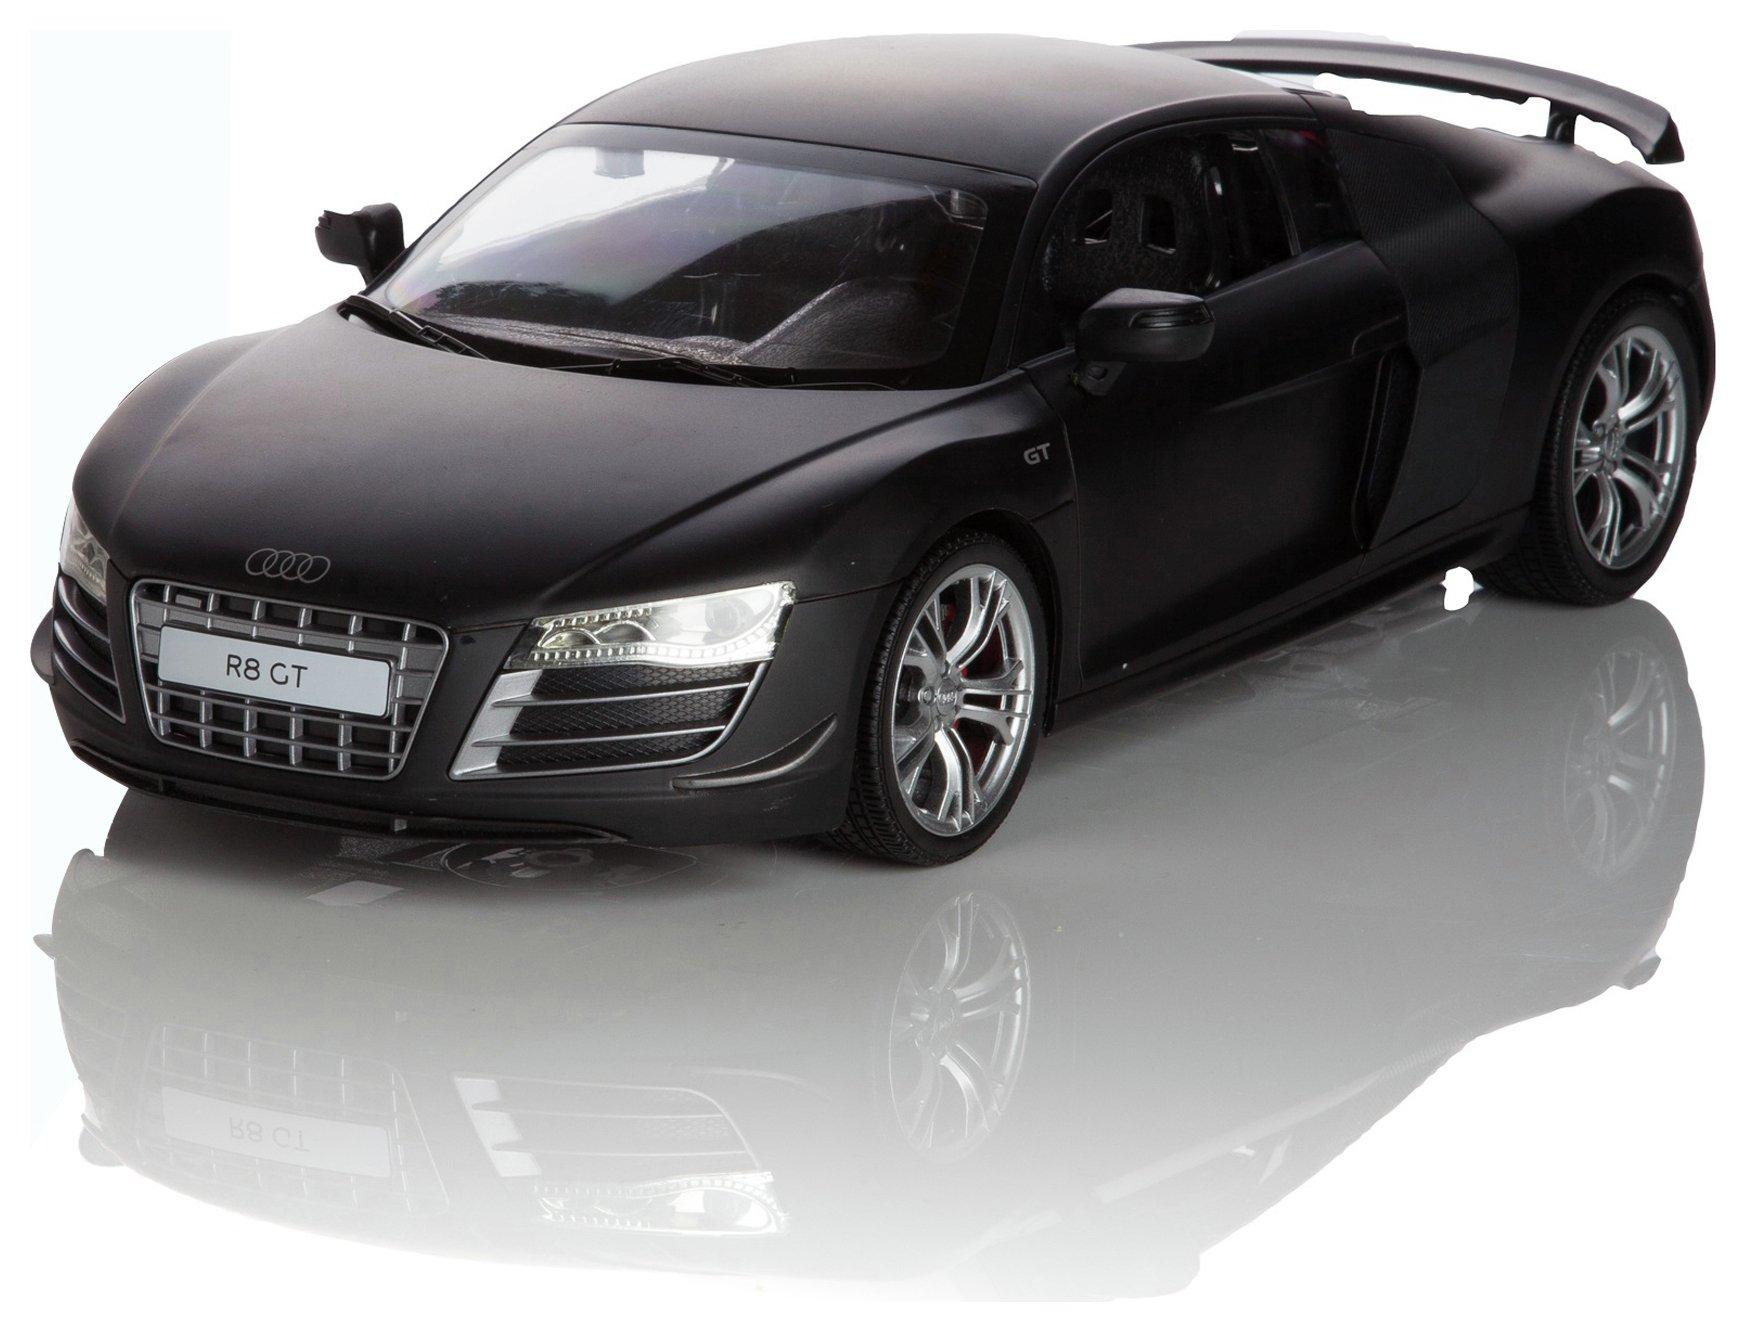 Audi R8 1:14 Remote Control Car   Black.